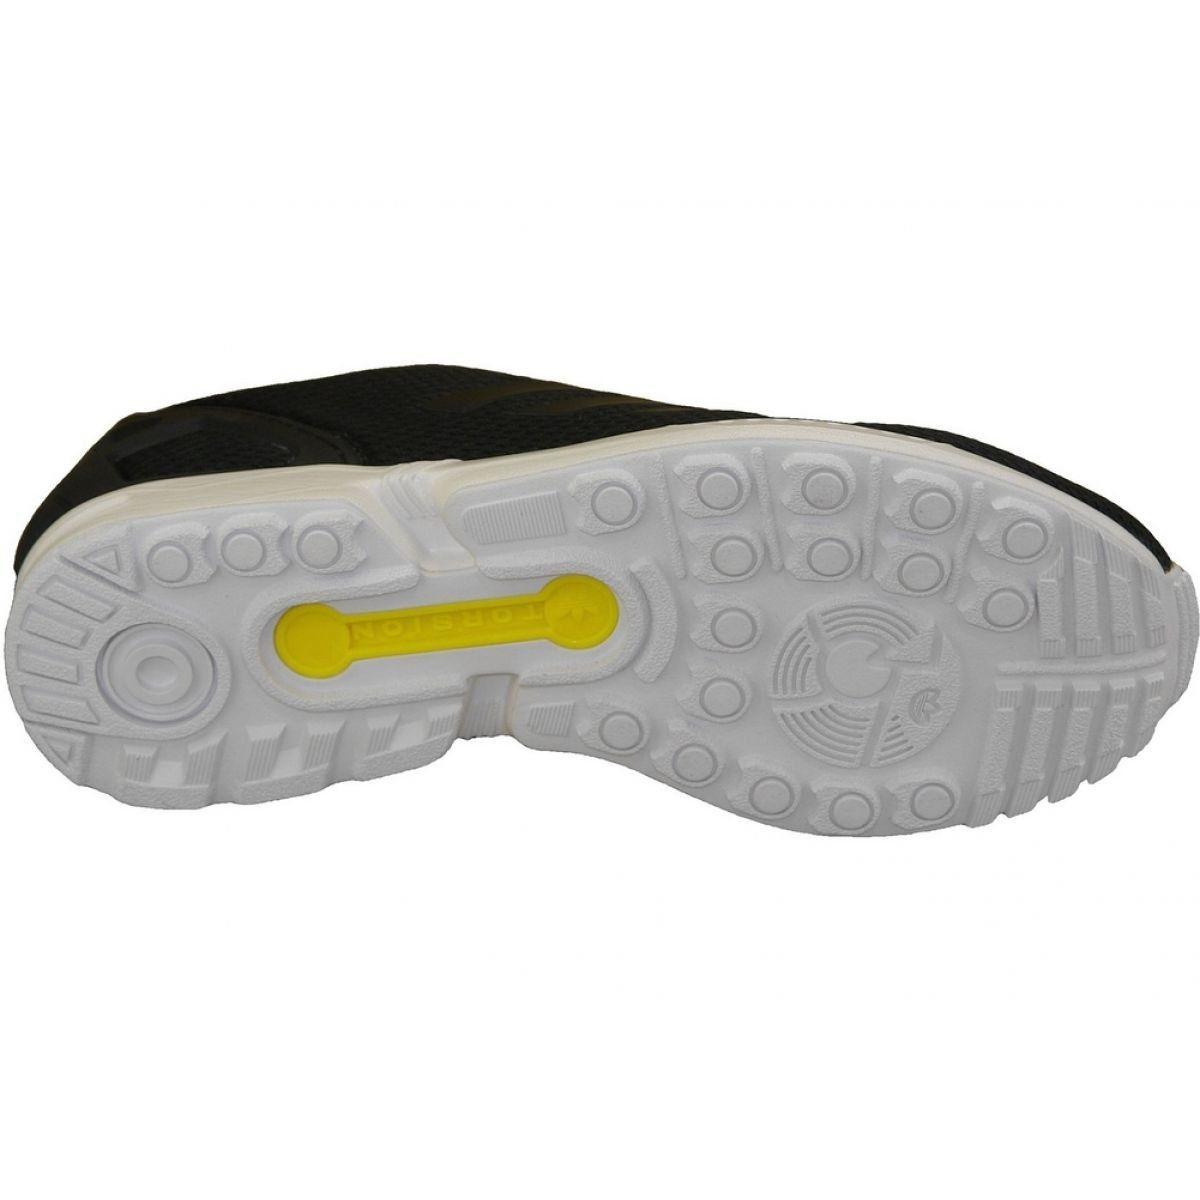 Buty Adidas Zx Flux K Jr M21294 Rozowe Adidas Zx Adidas Zx Flux Sports Shoes Adidas